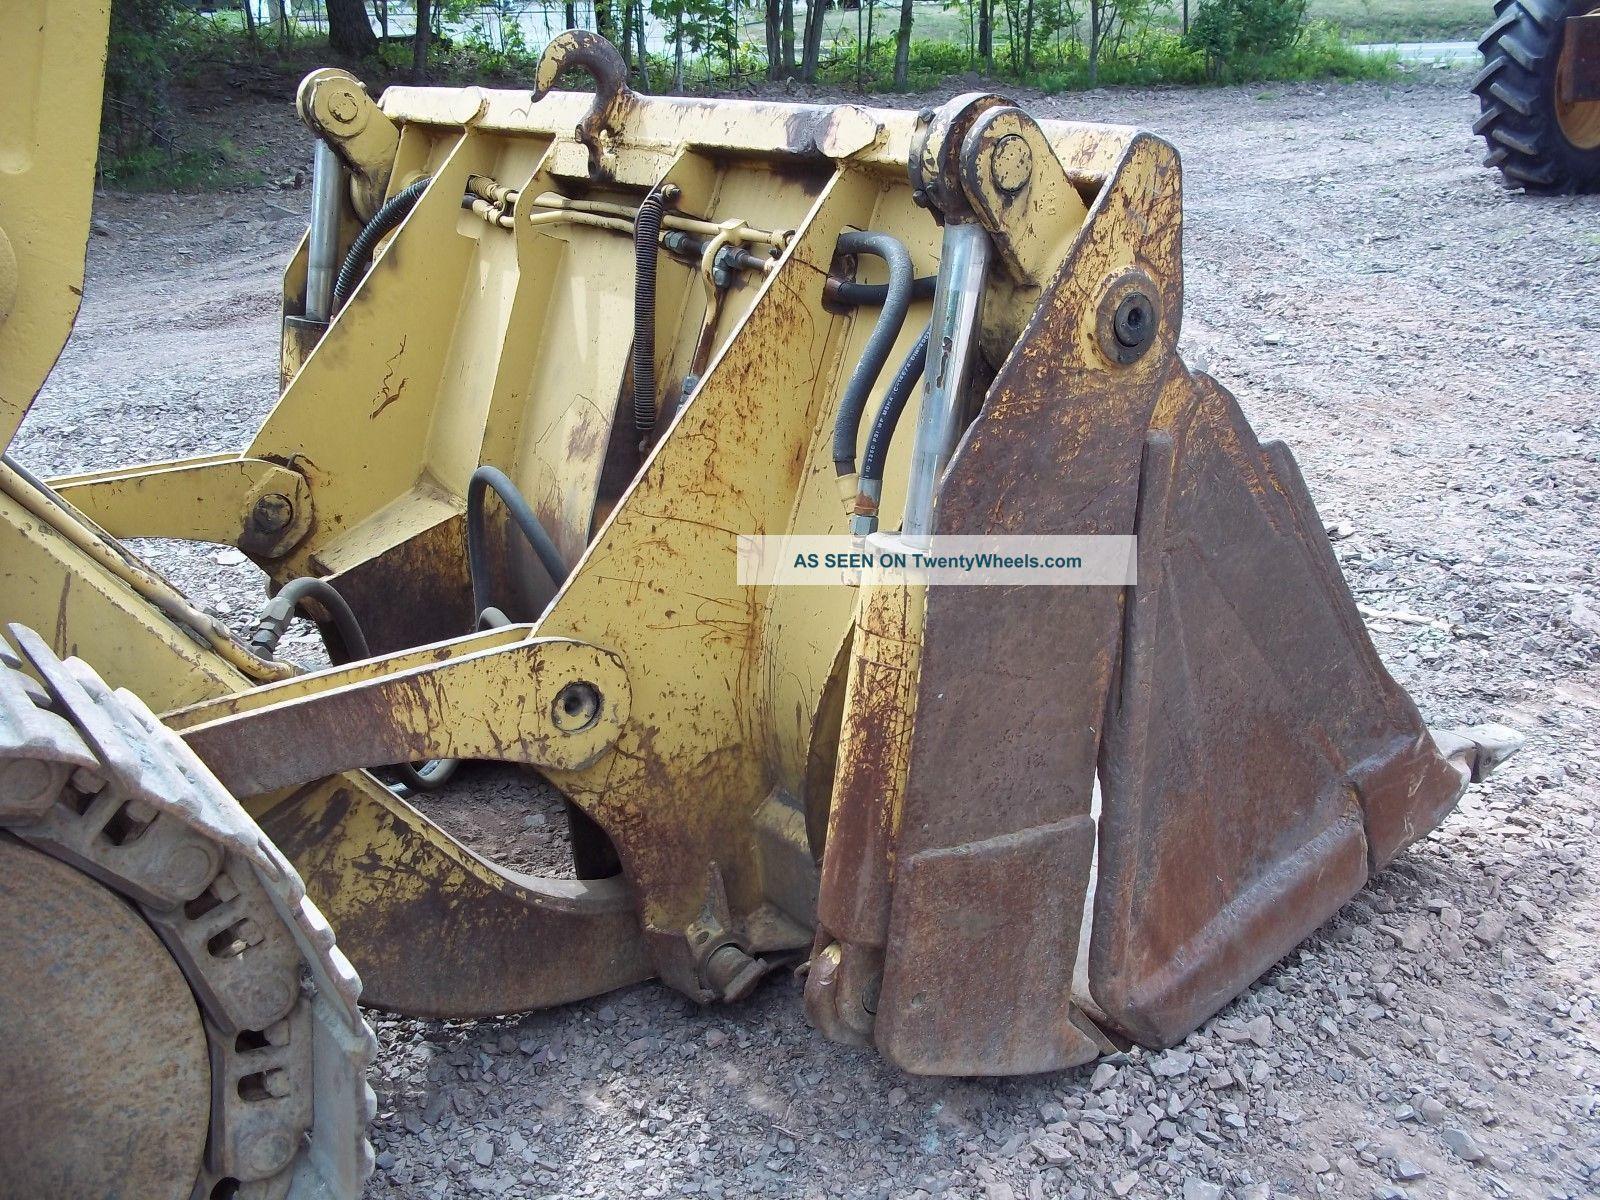 pale cingolate Dresser_international_250b_crawler_track_loader_traxcavator_excavator_4_in_1_6_lgw